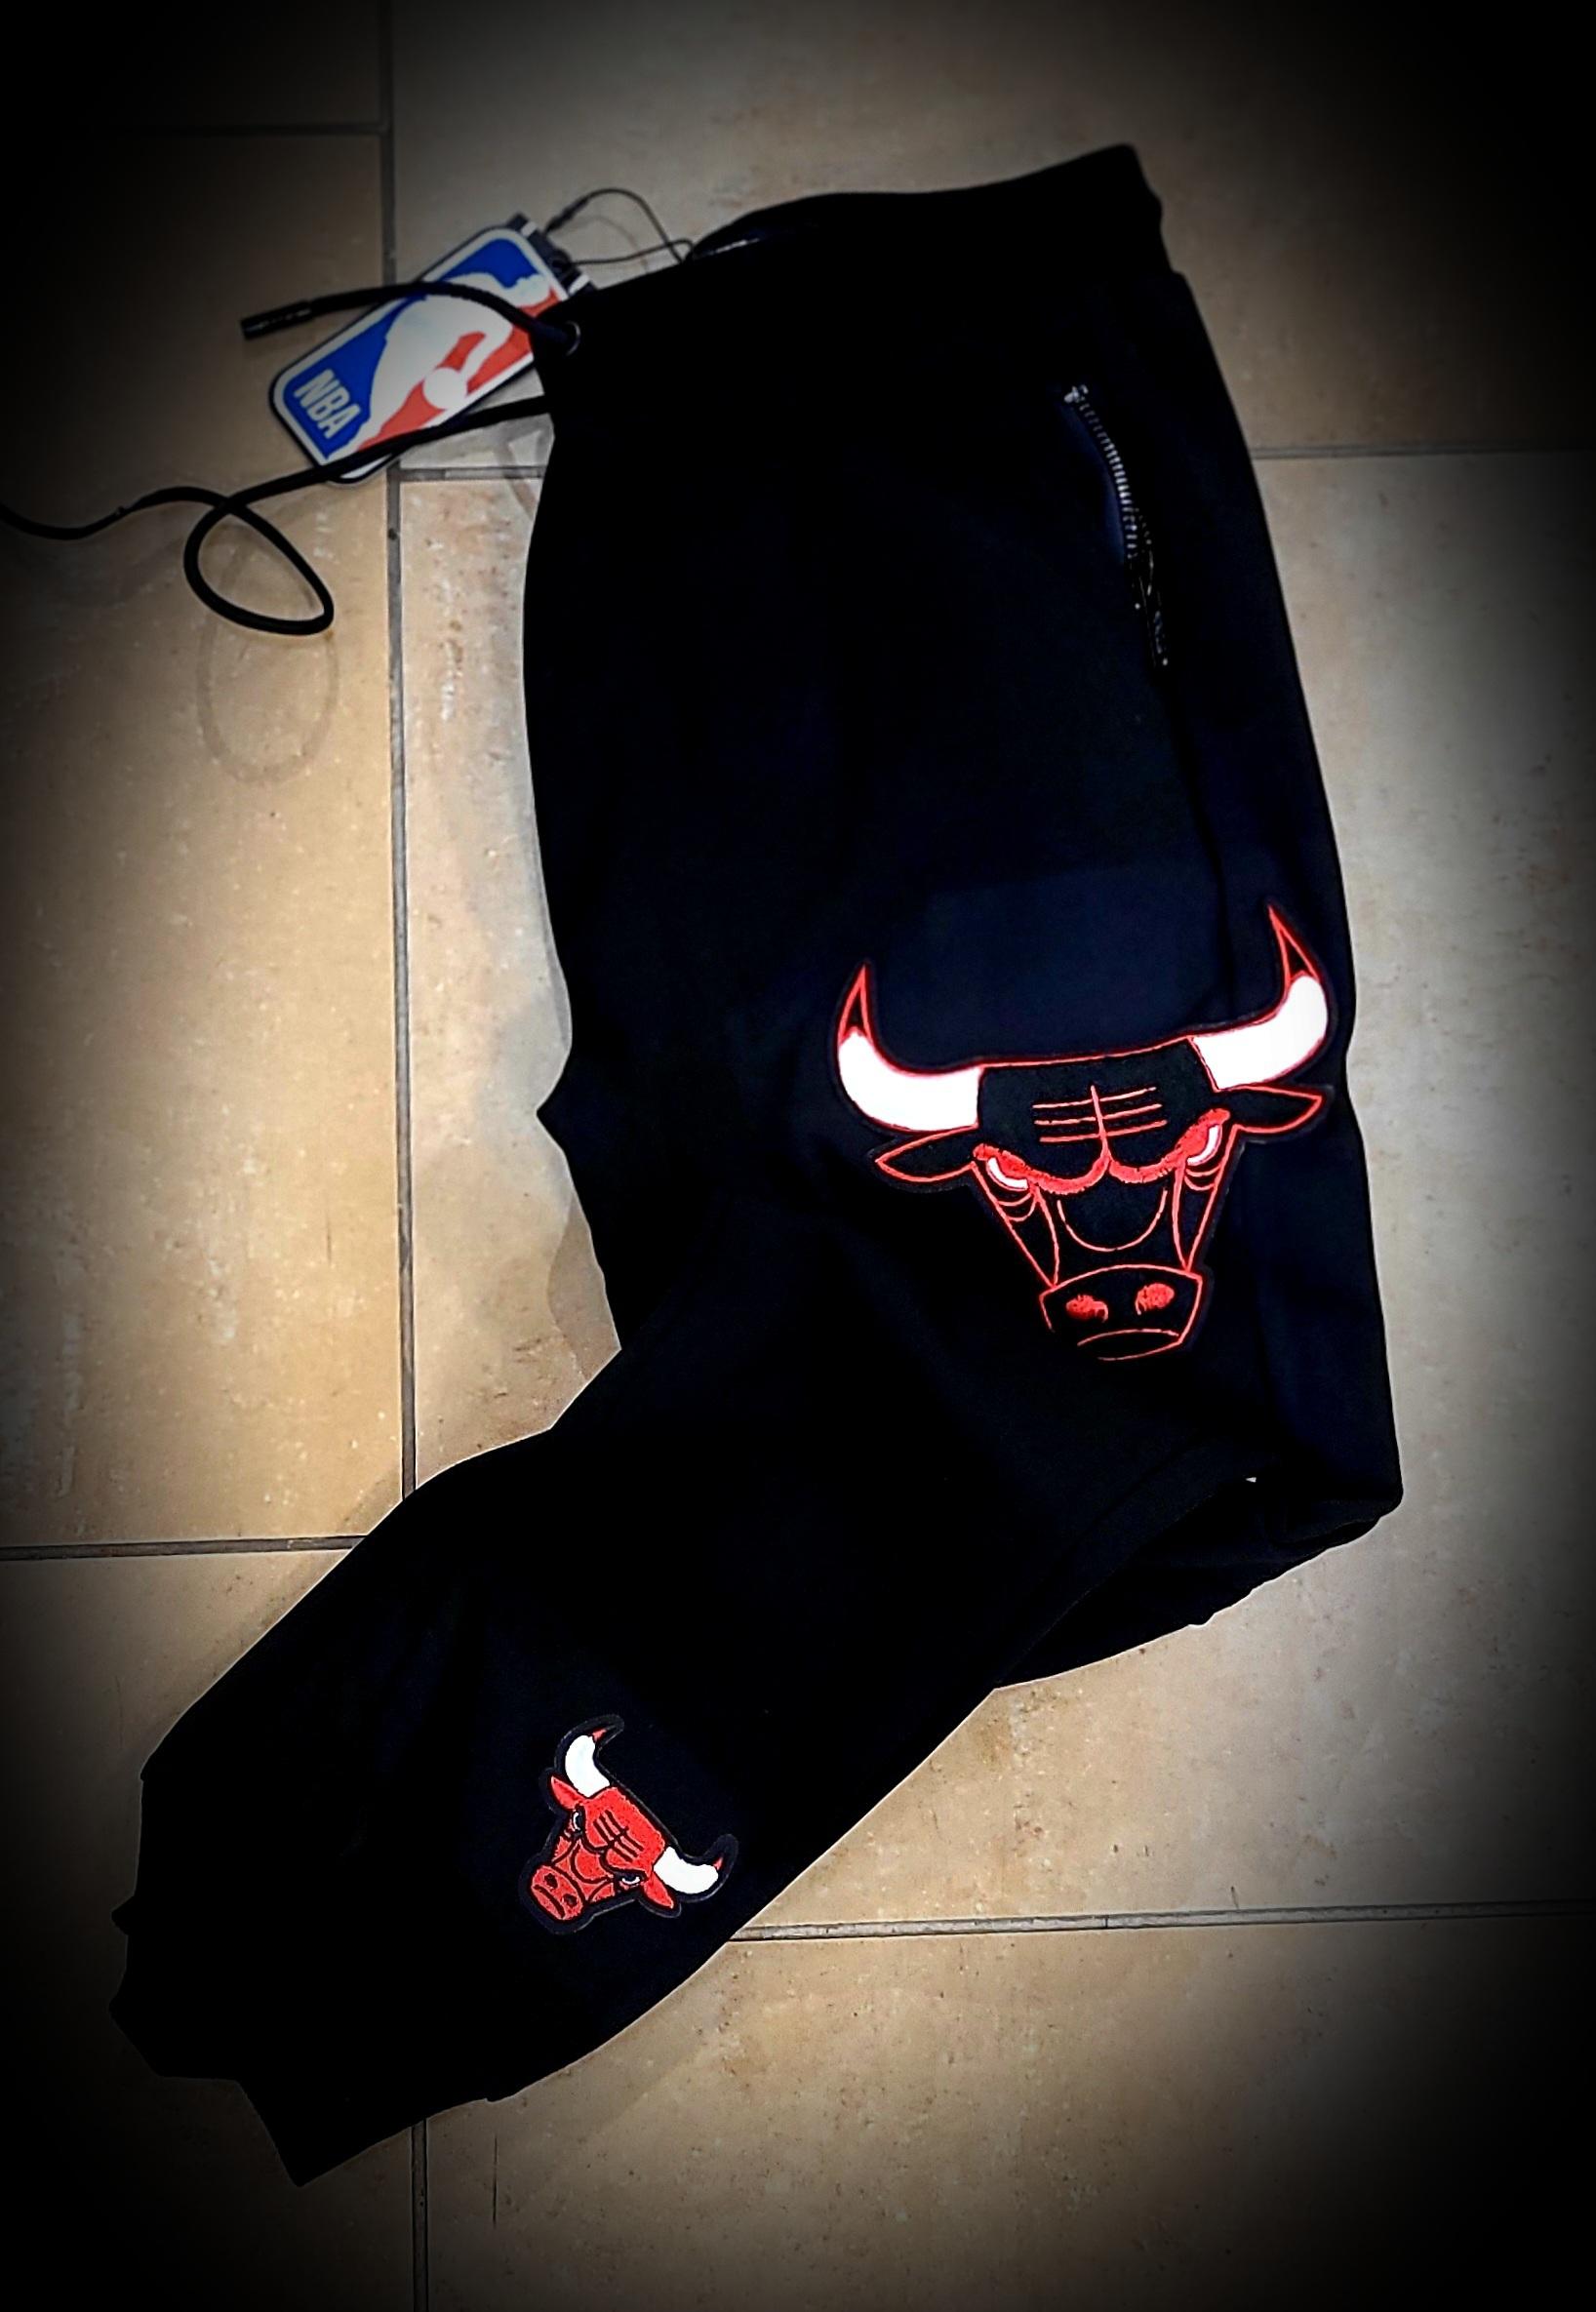 CHICAGO BULLS BLACK PANTS